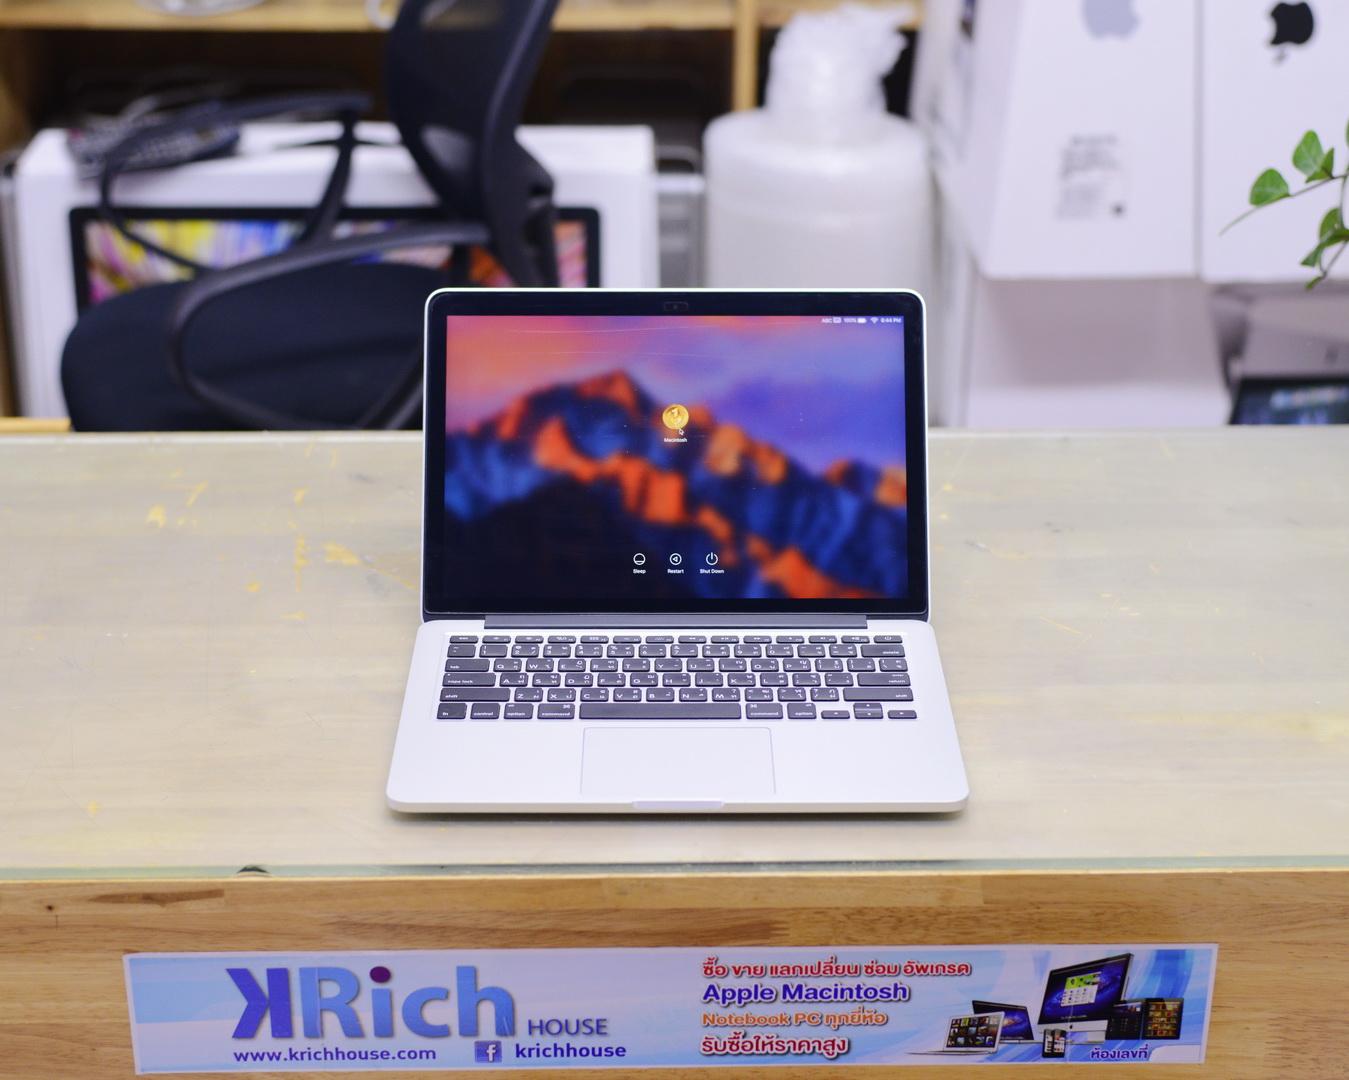 MacBook Pro (13-inch, Early 2015) - Core i5 2.7GHz RAM 8GB SSD 128GB